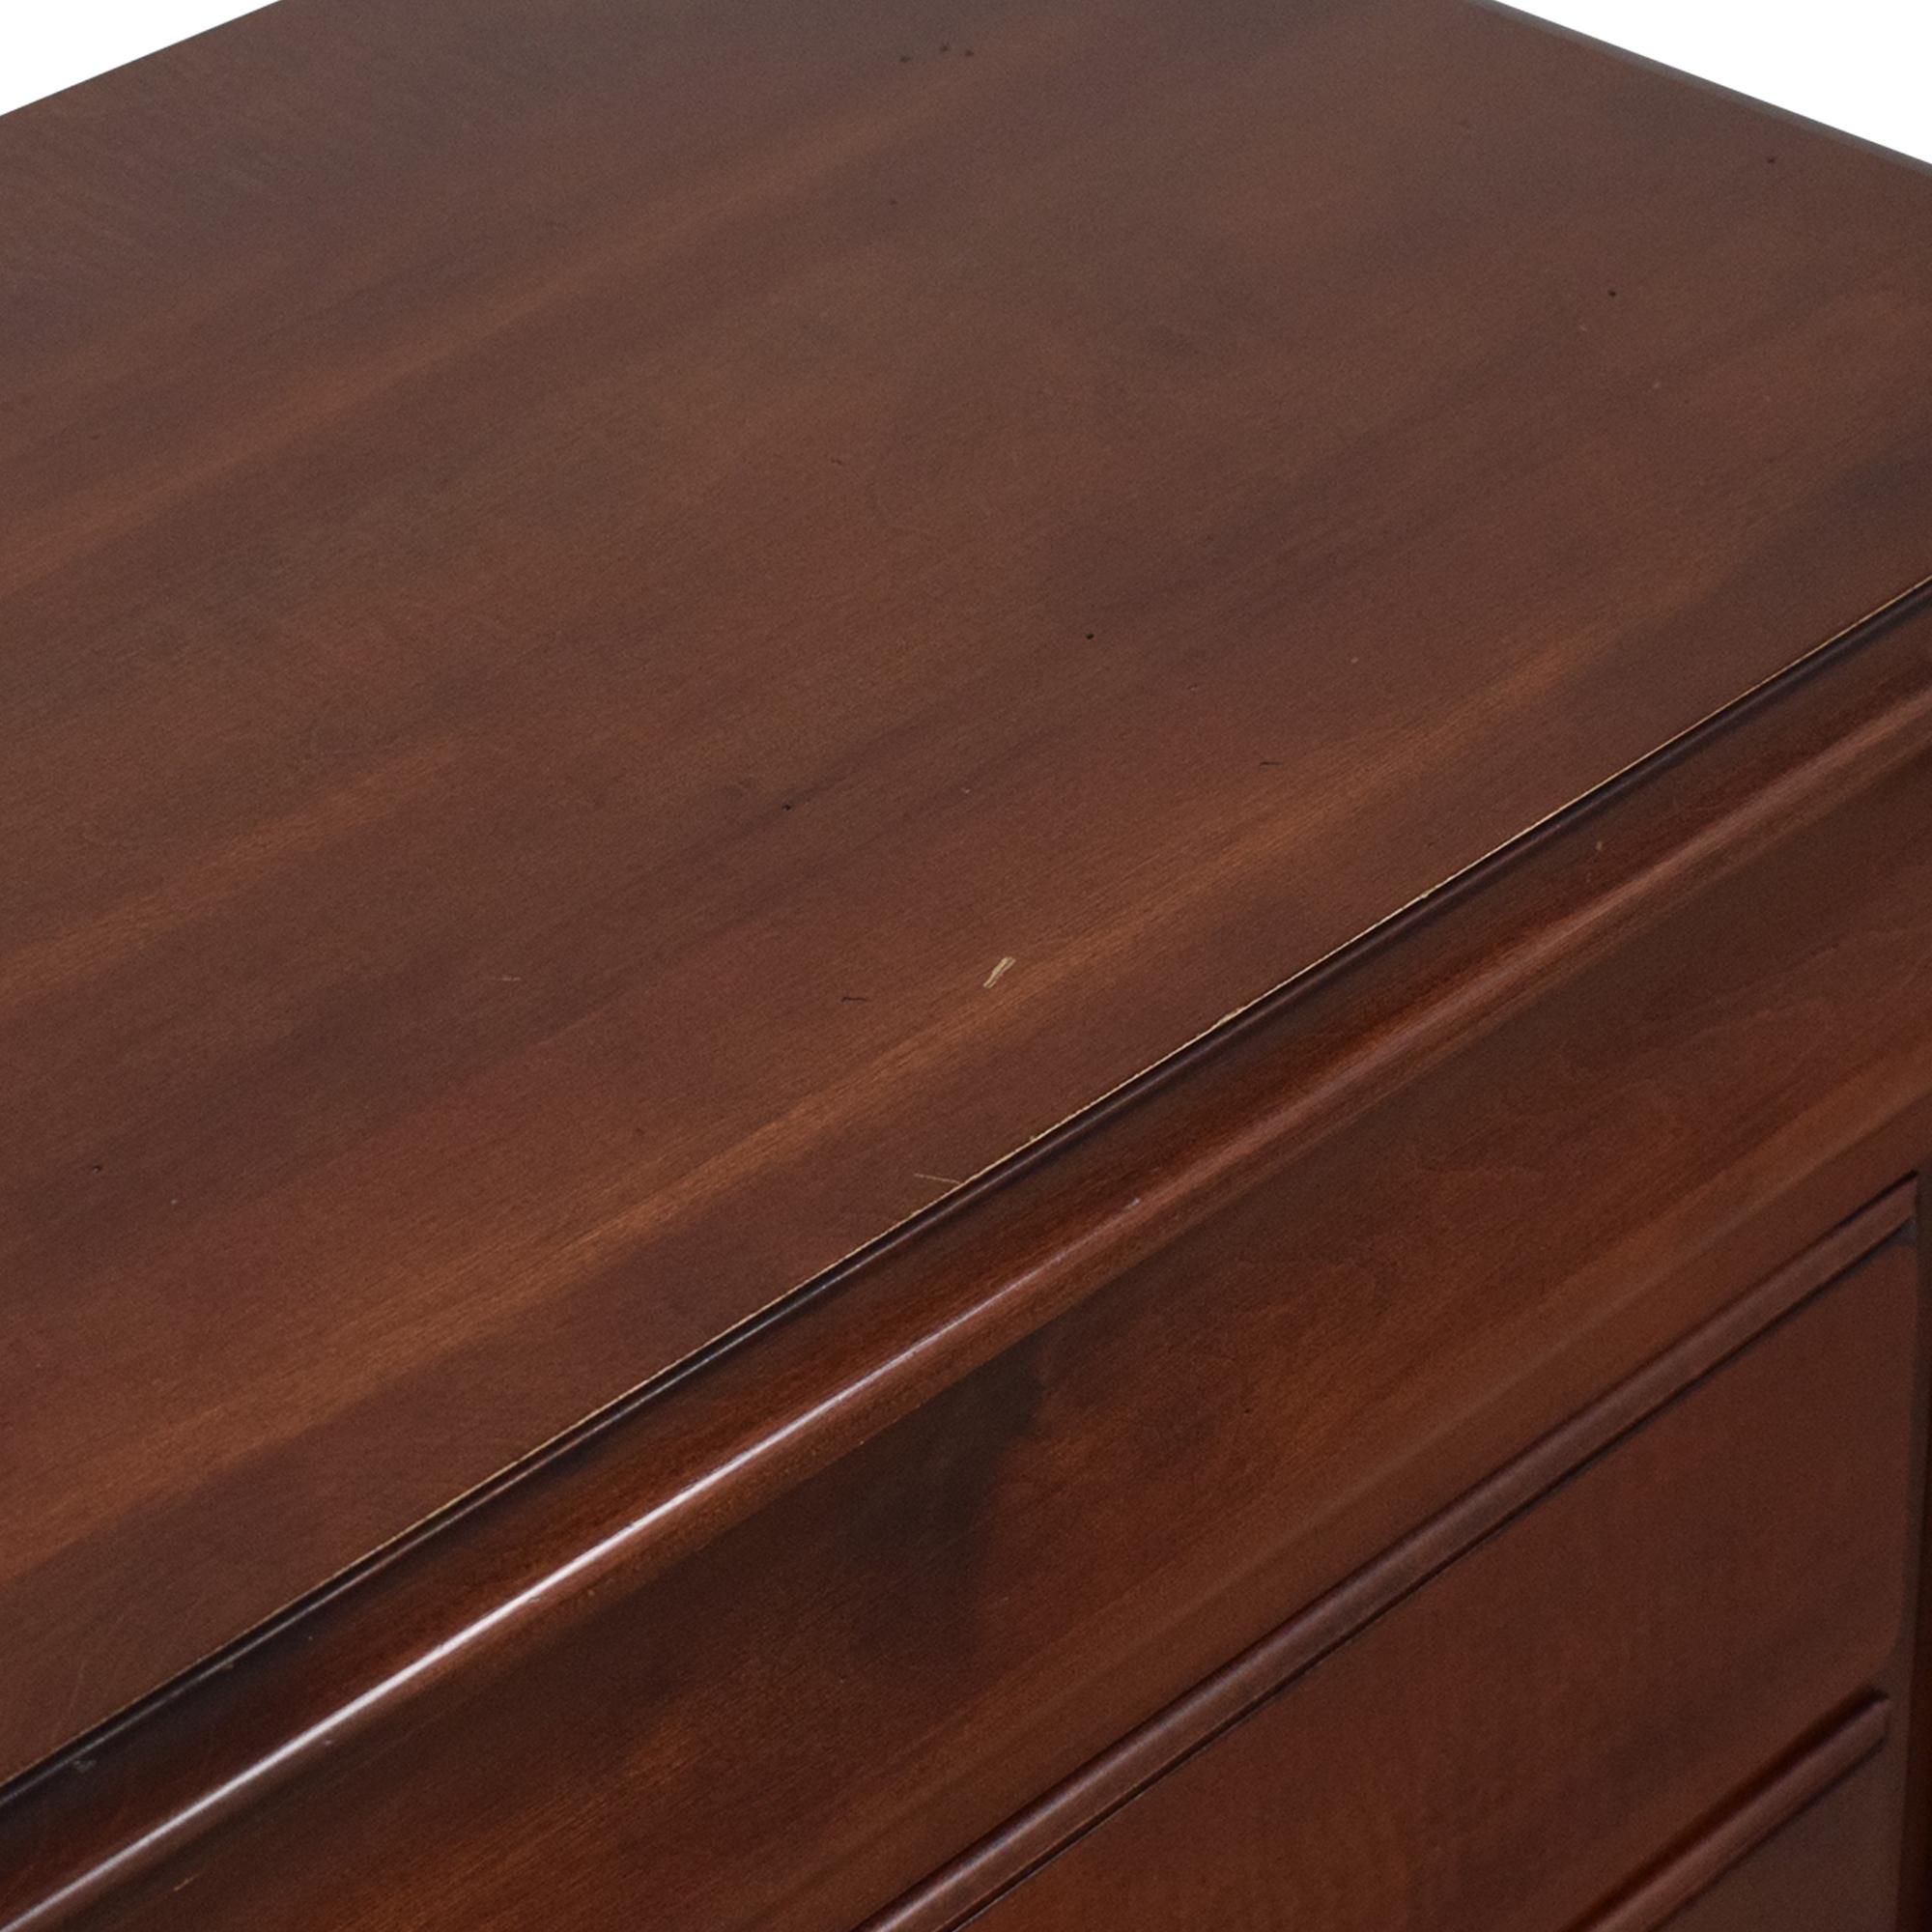 Ethan Allen Ethan Allen Marques Dresser on sale